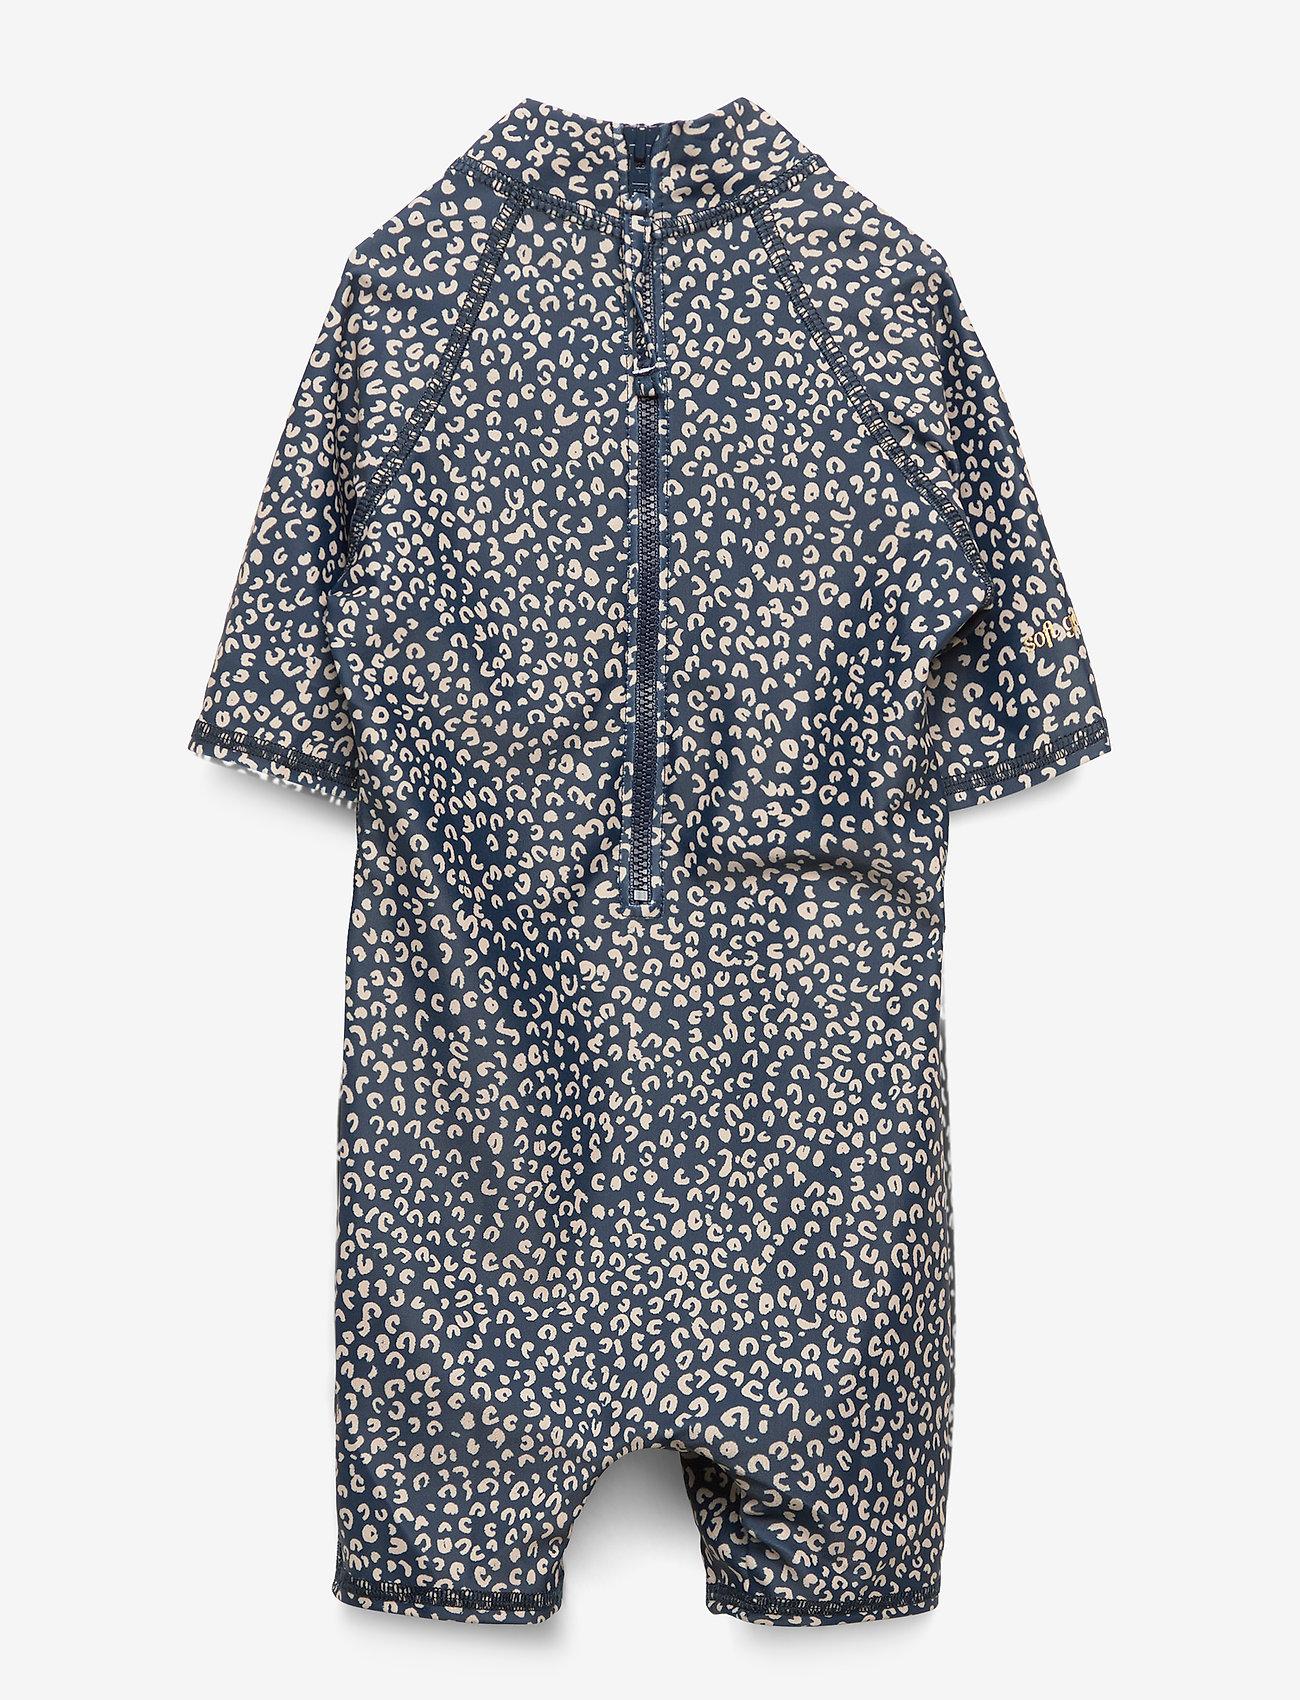 Soft Gallery Rey Sunsuit - Badkläder Dress Blue, Aop Leospot